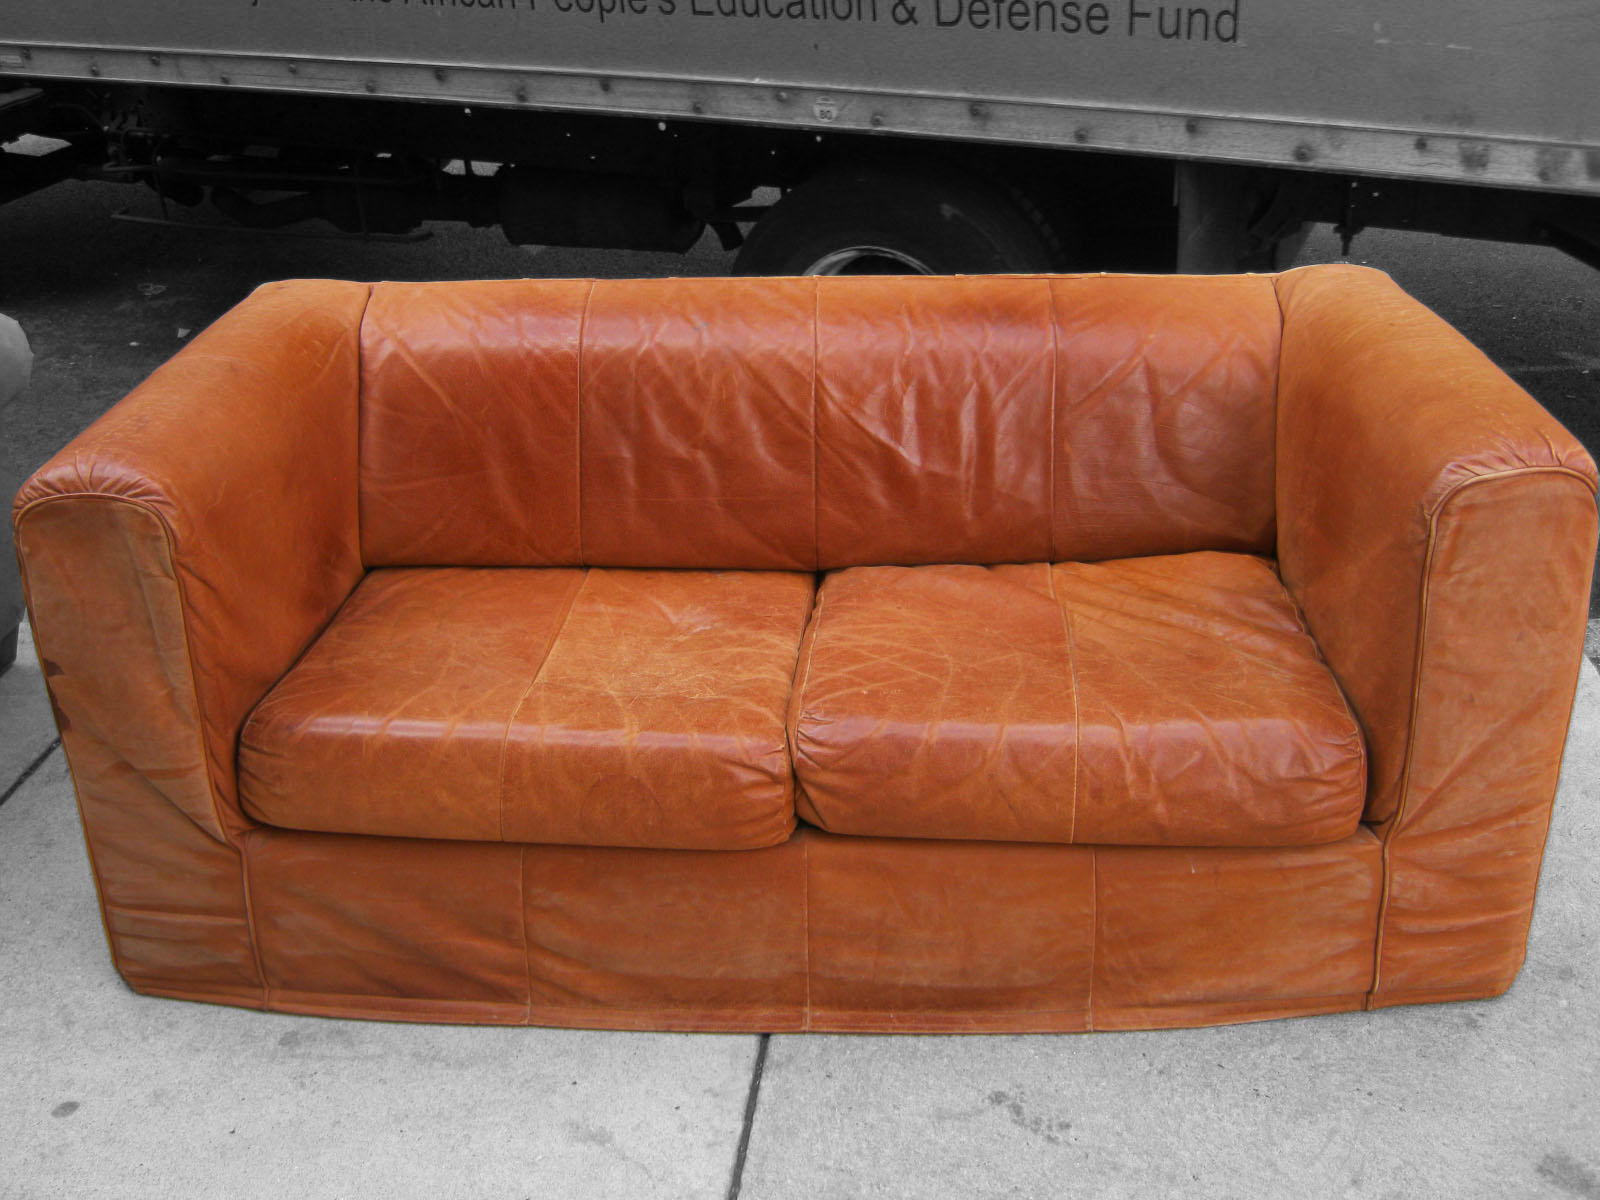 Enjoyable Uhuru Furniture Collectibles Camel Colored Leather Sofa Beatyapartments Chair Design Images Beatyapartmentscom